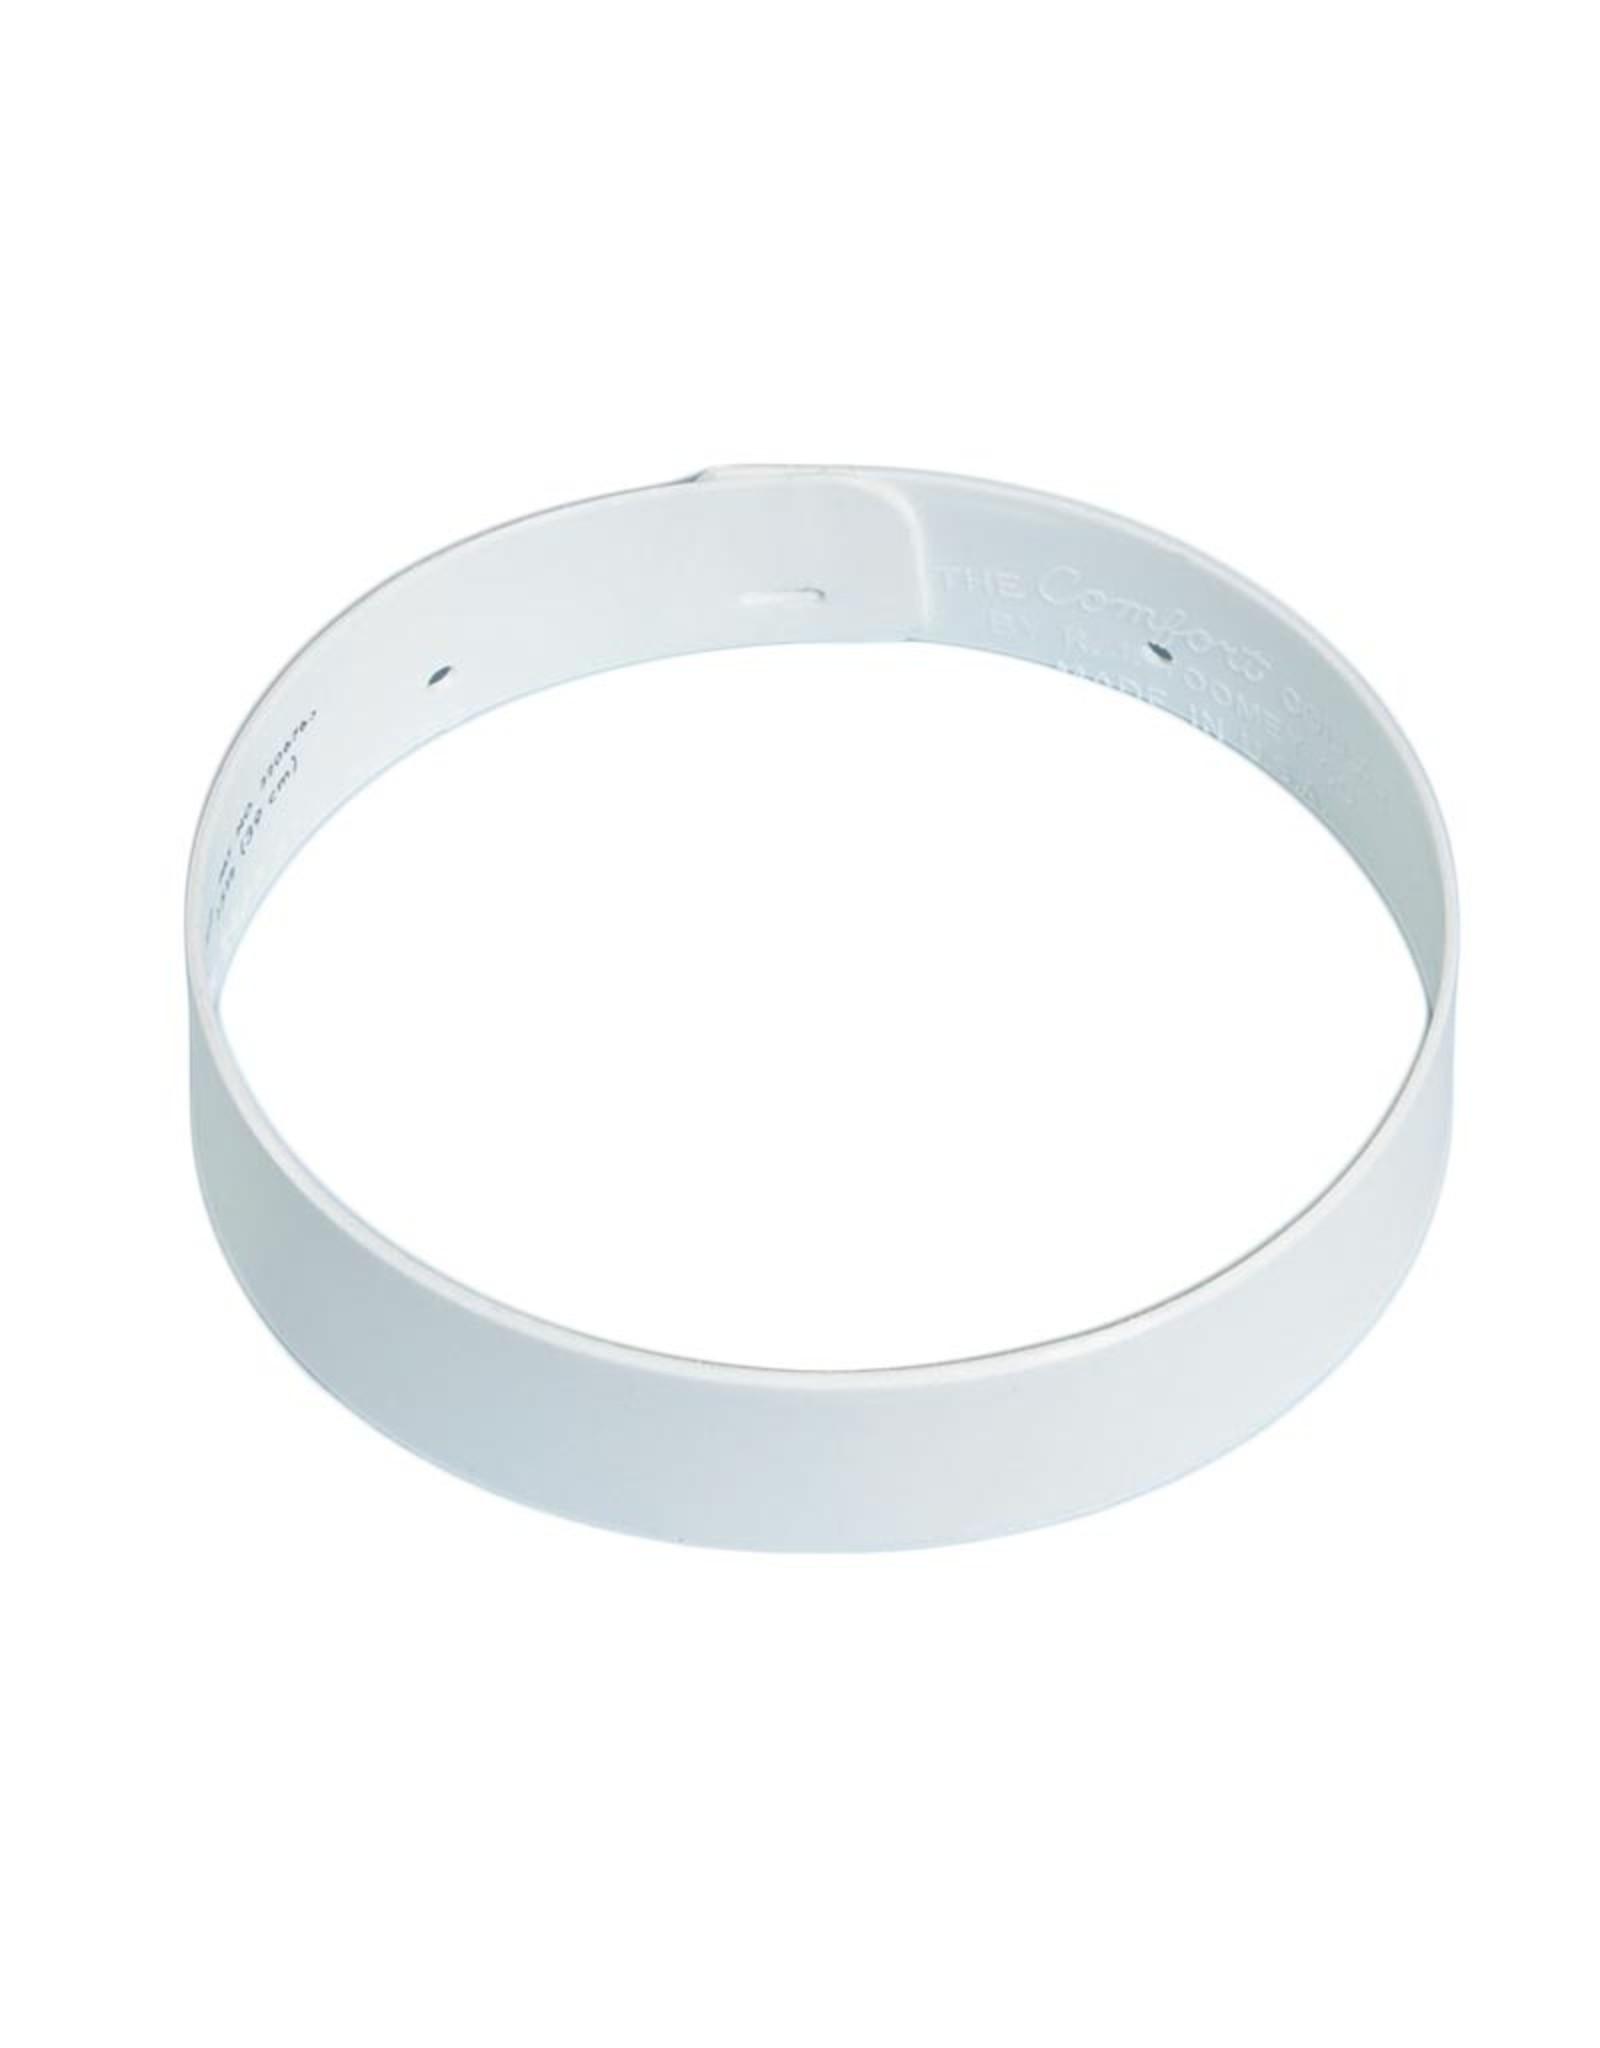 Single-Ply Comfort Collar 17 #2 Collar Height